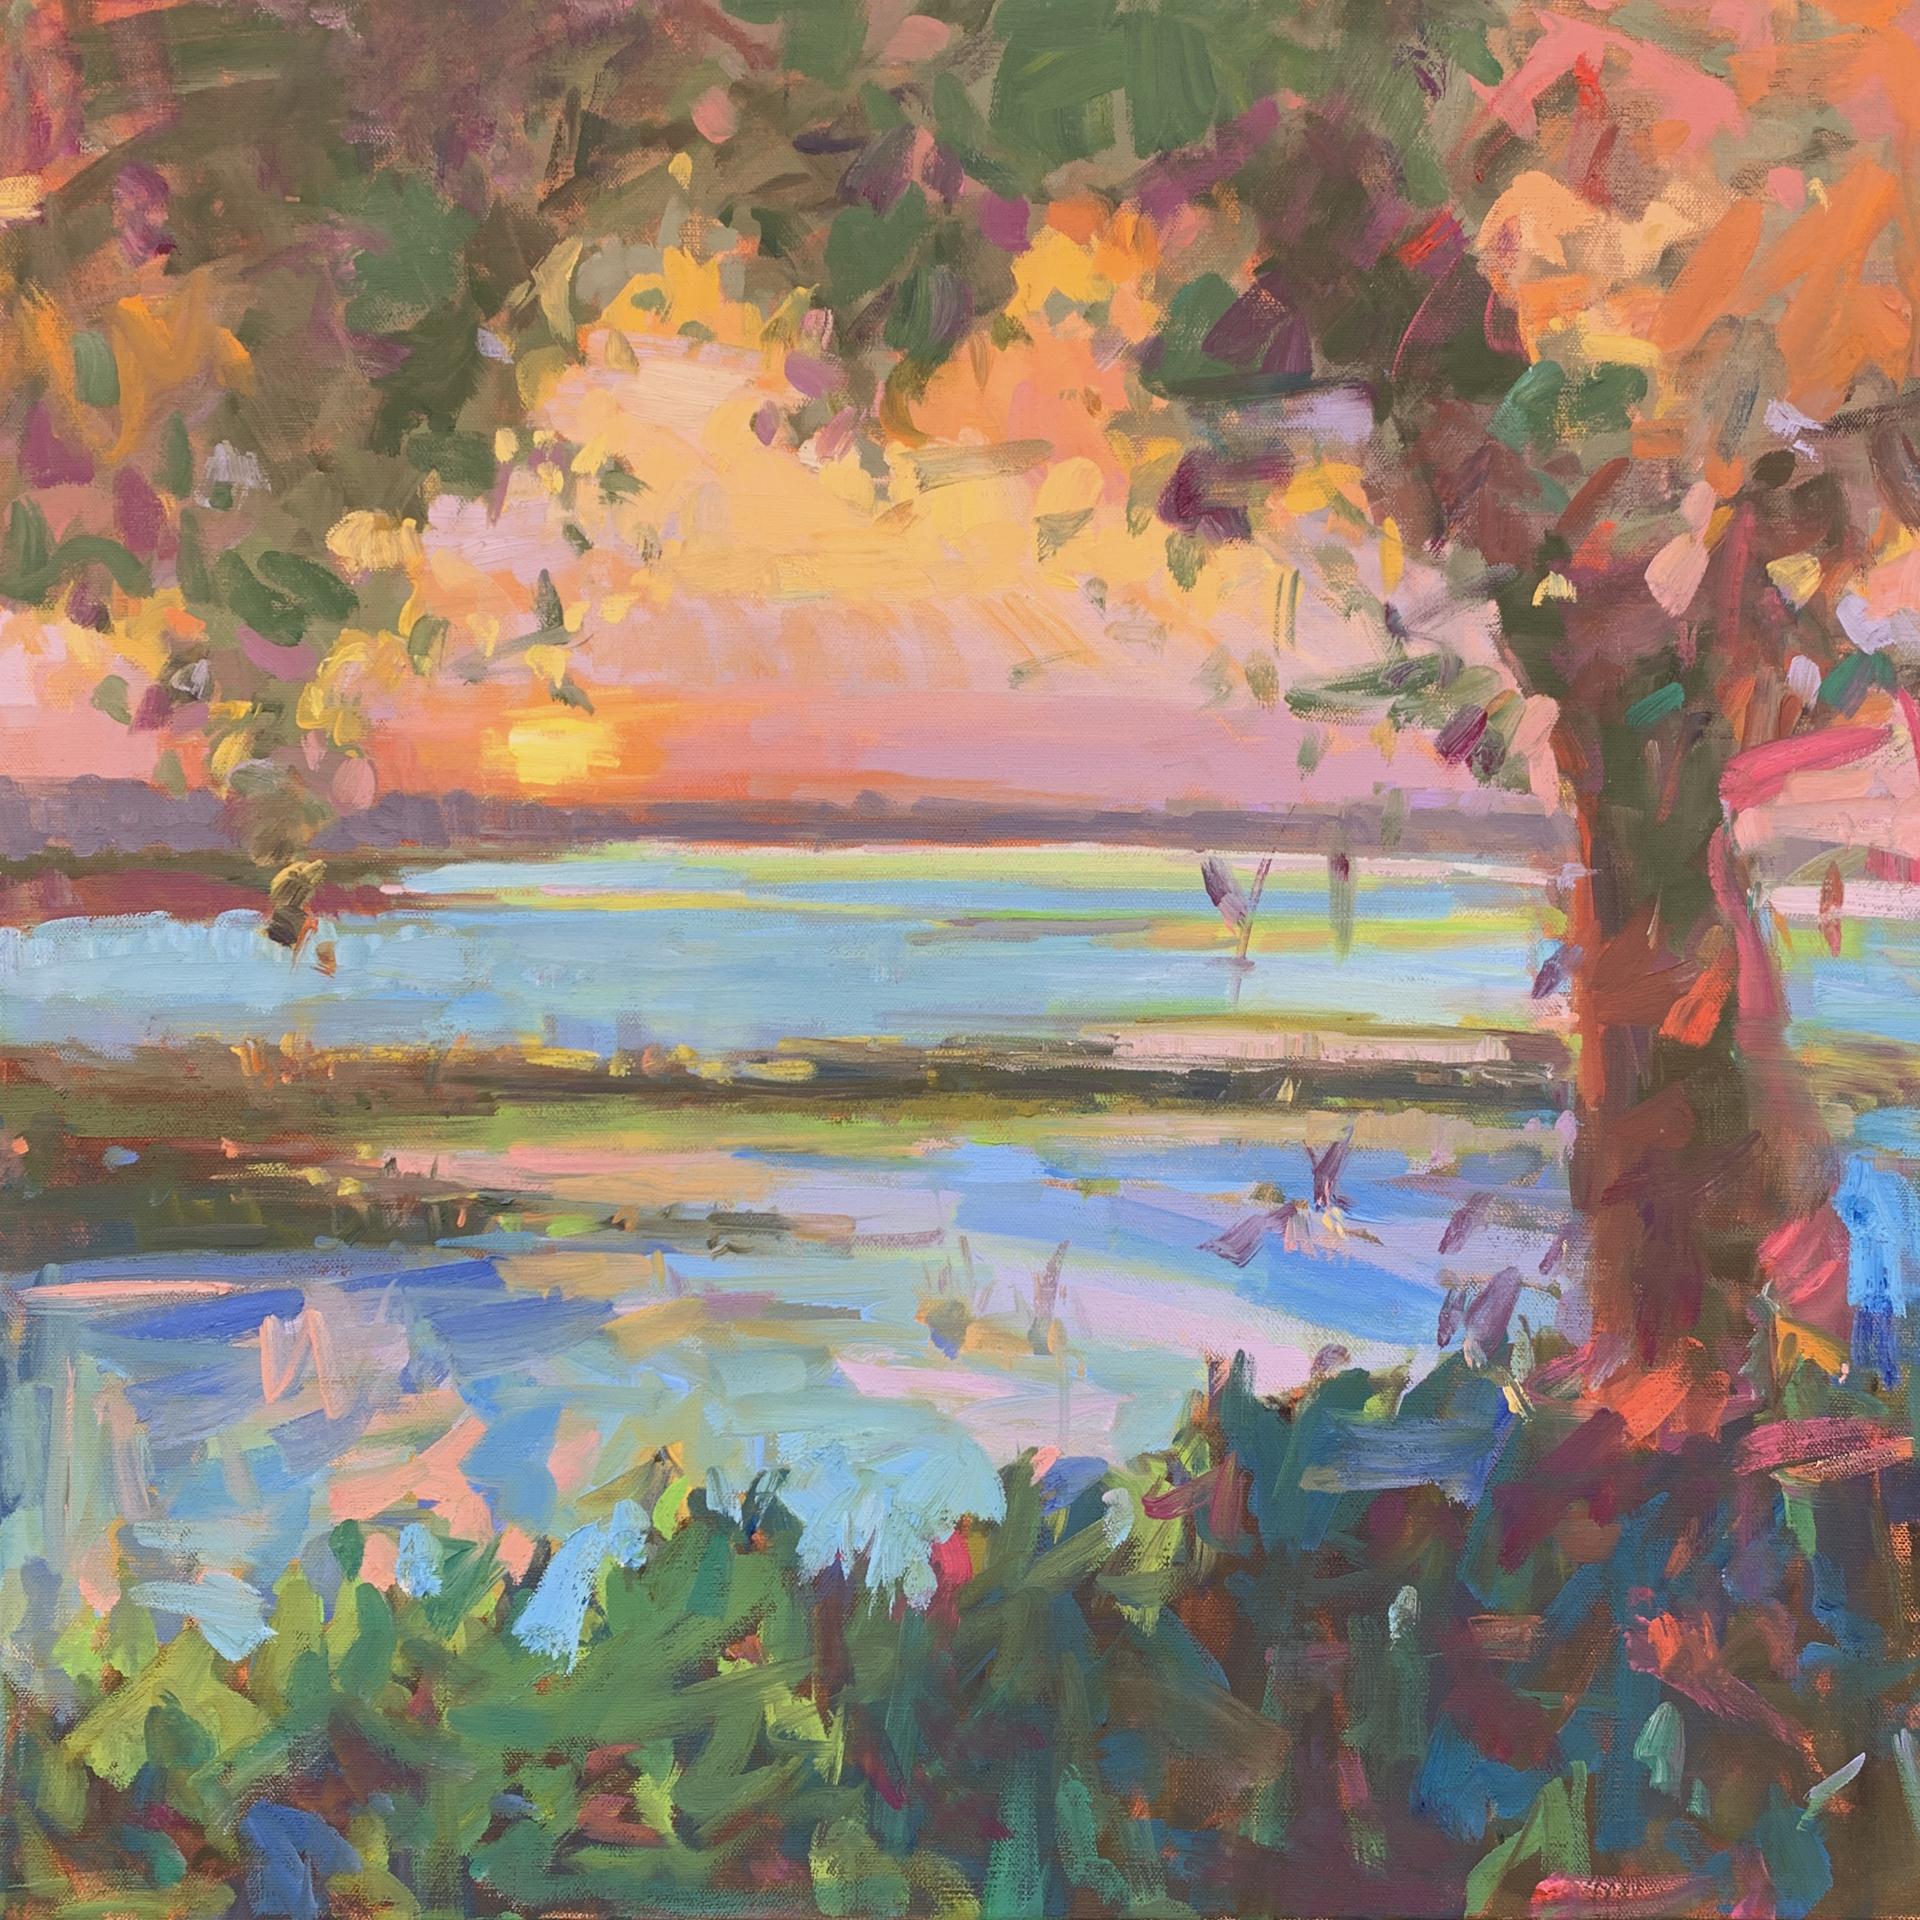 Kiawah at Sunrise by Marissa Vogl